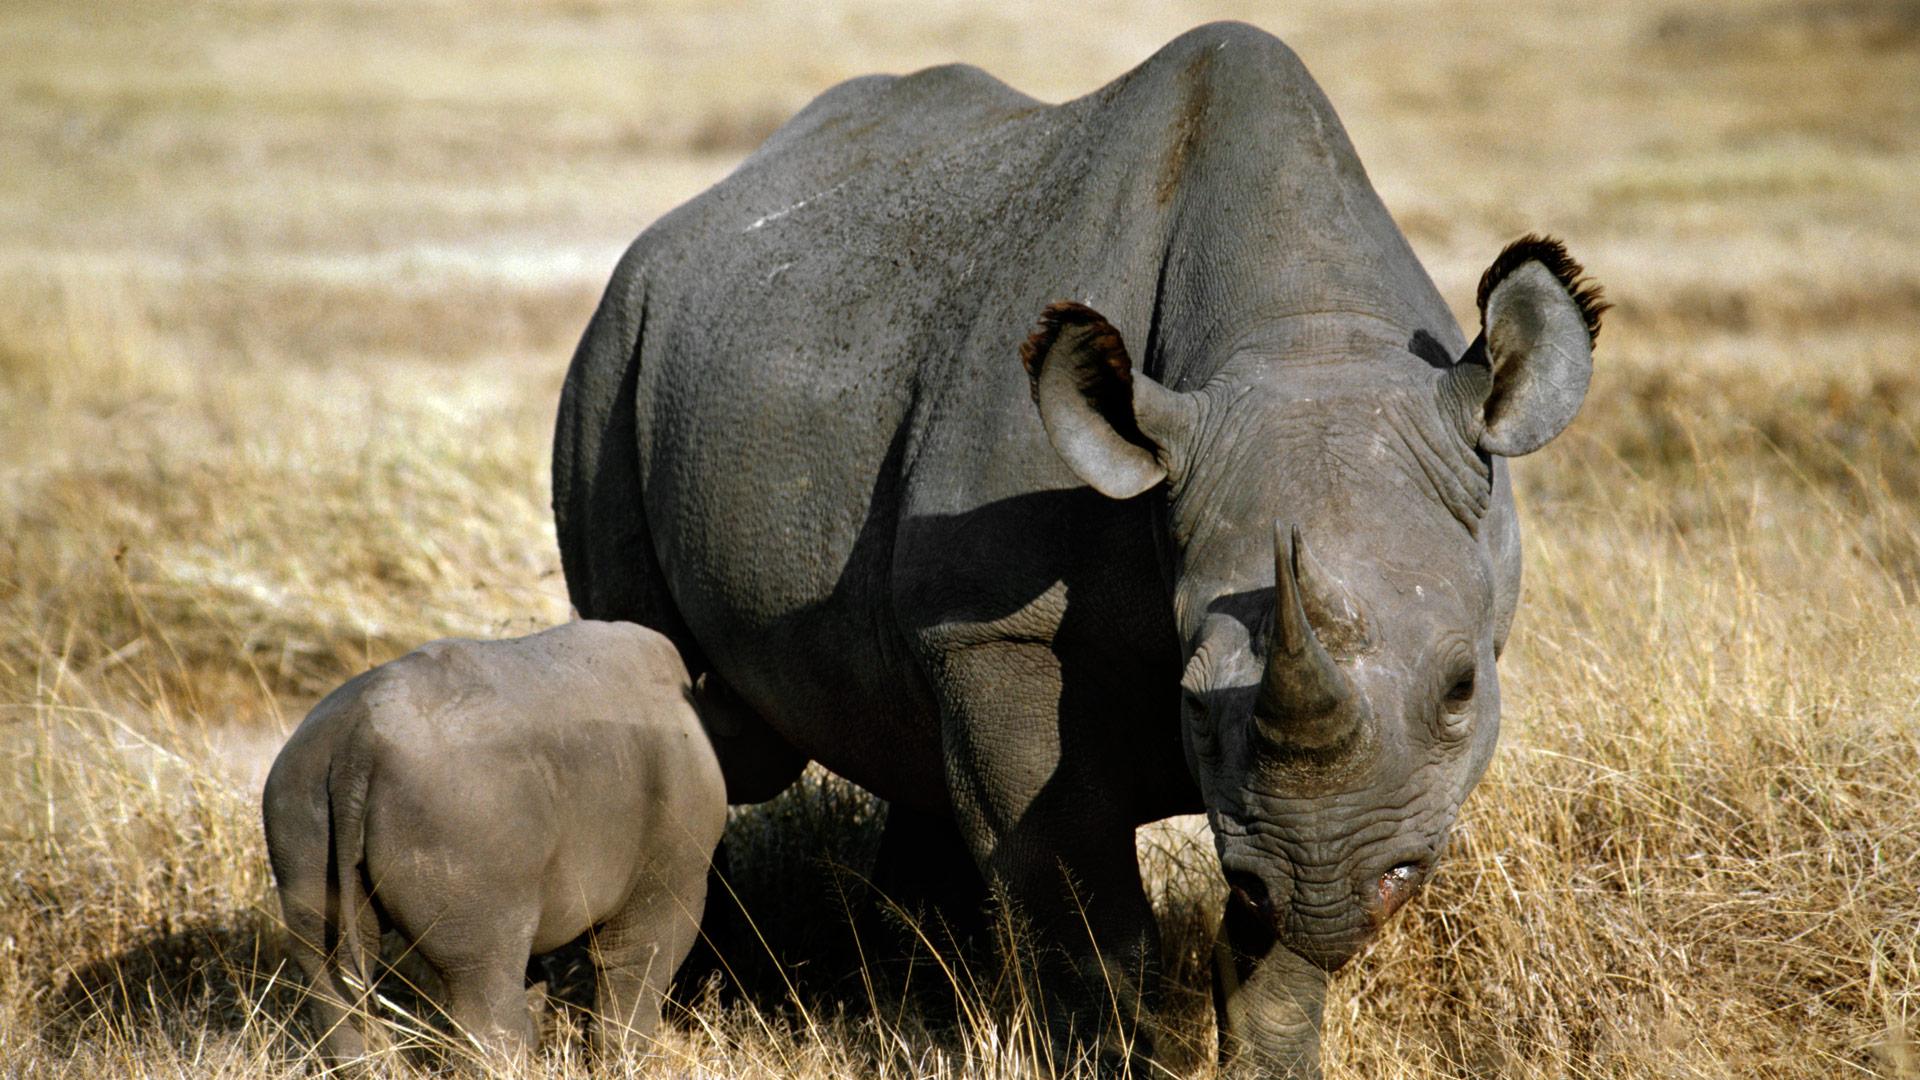 Black rhinoceros with nursing young, Ngorongoro Crater, Tanzania.